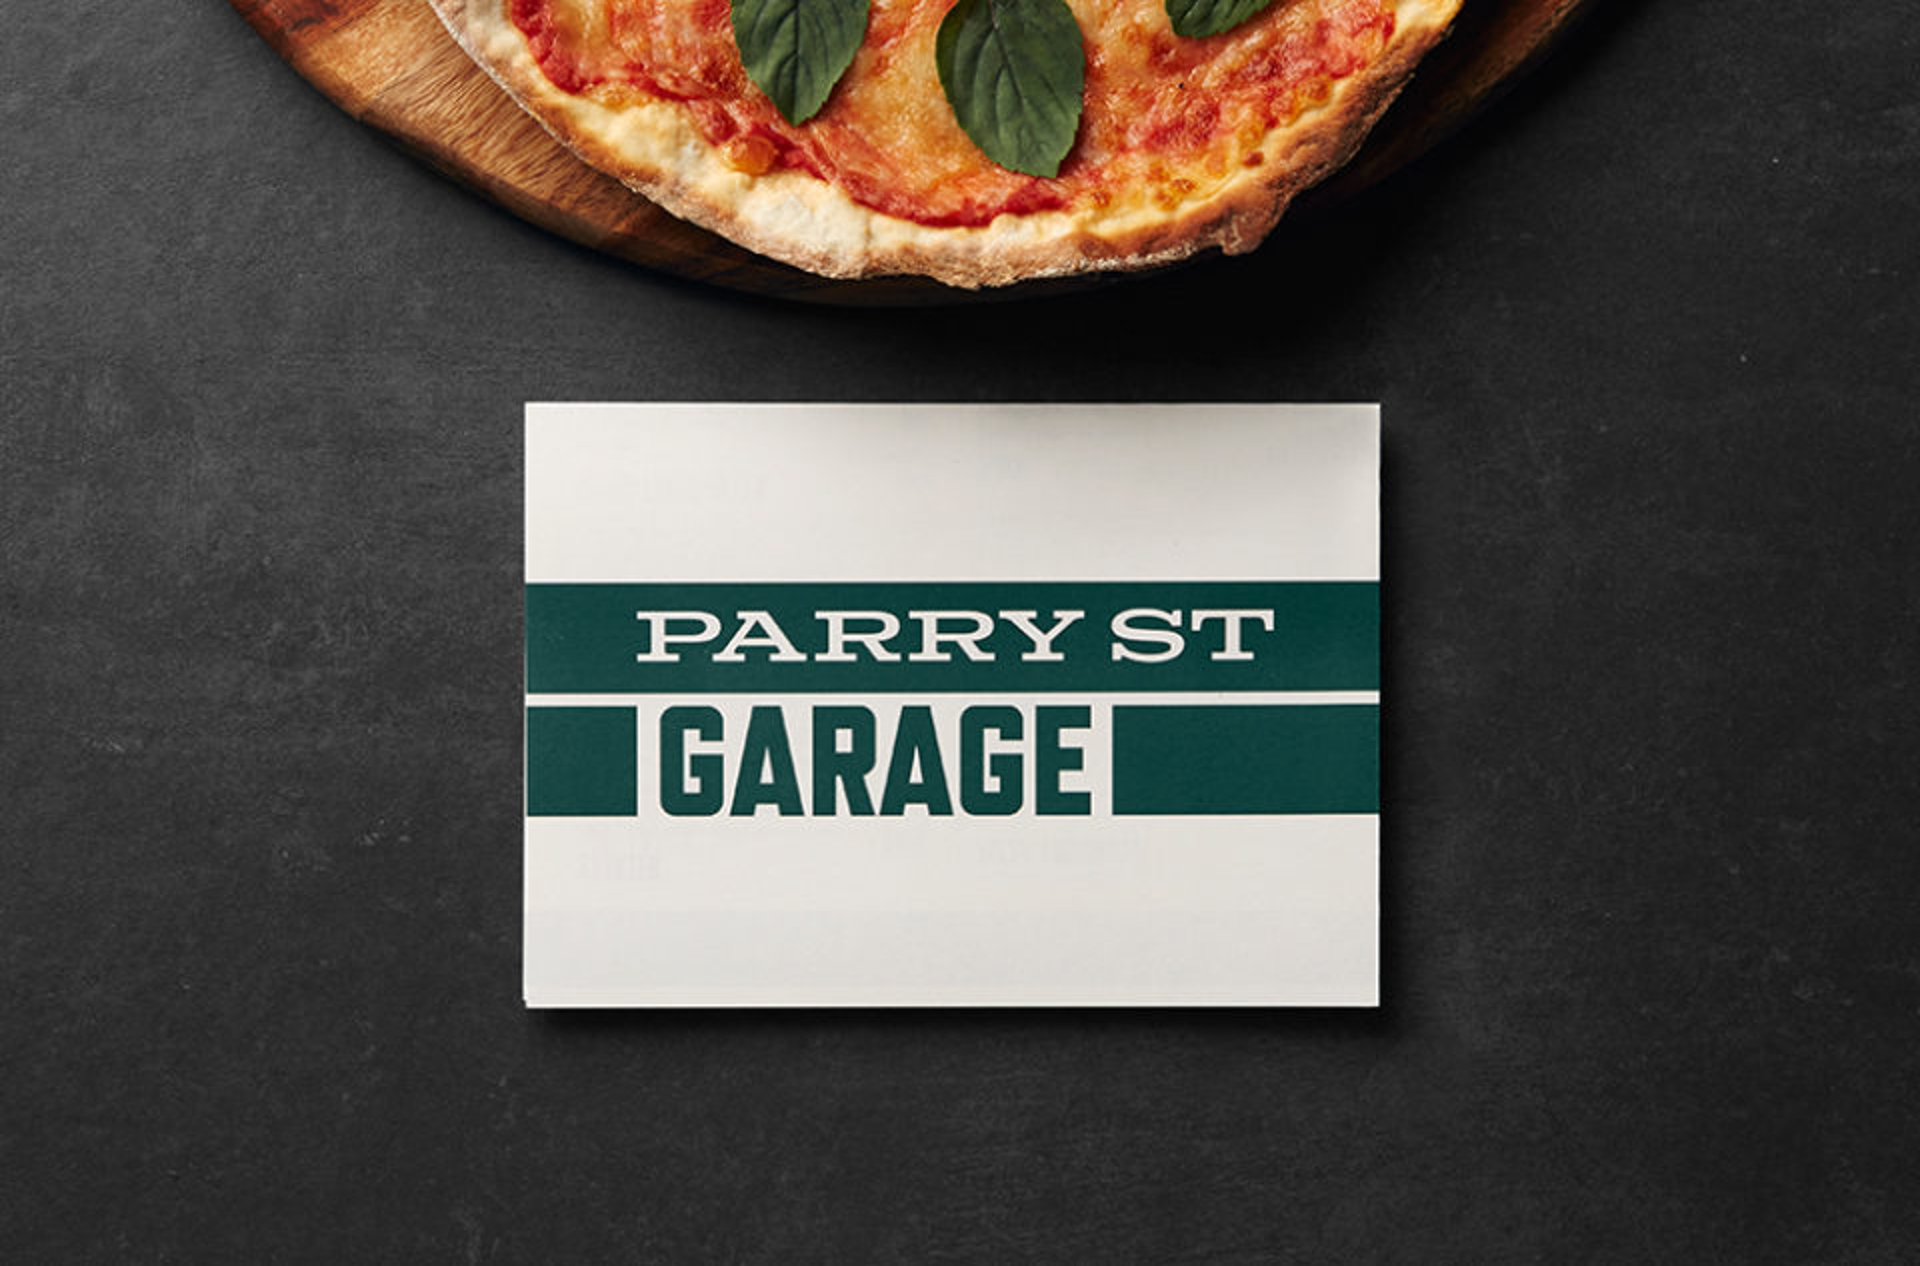 Headjam parry street garage 02